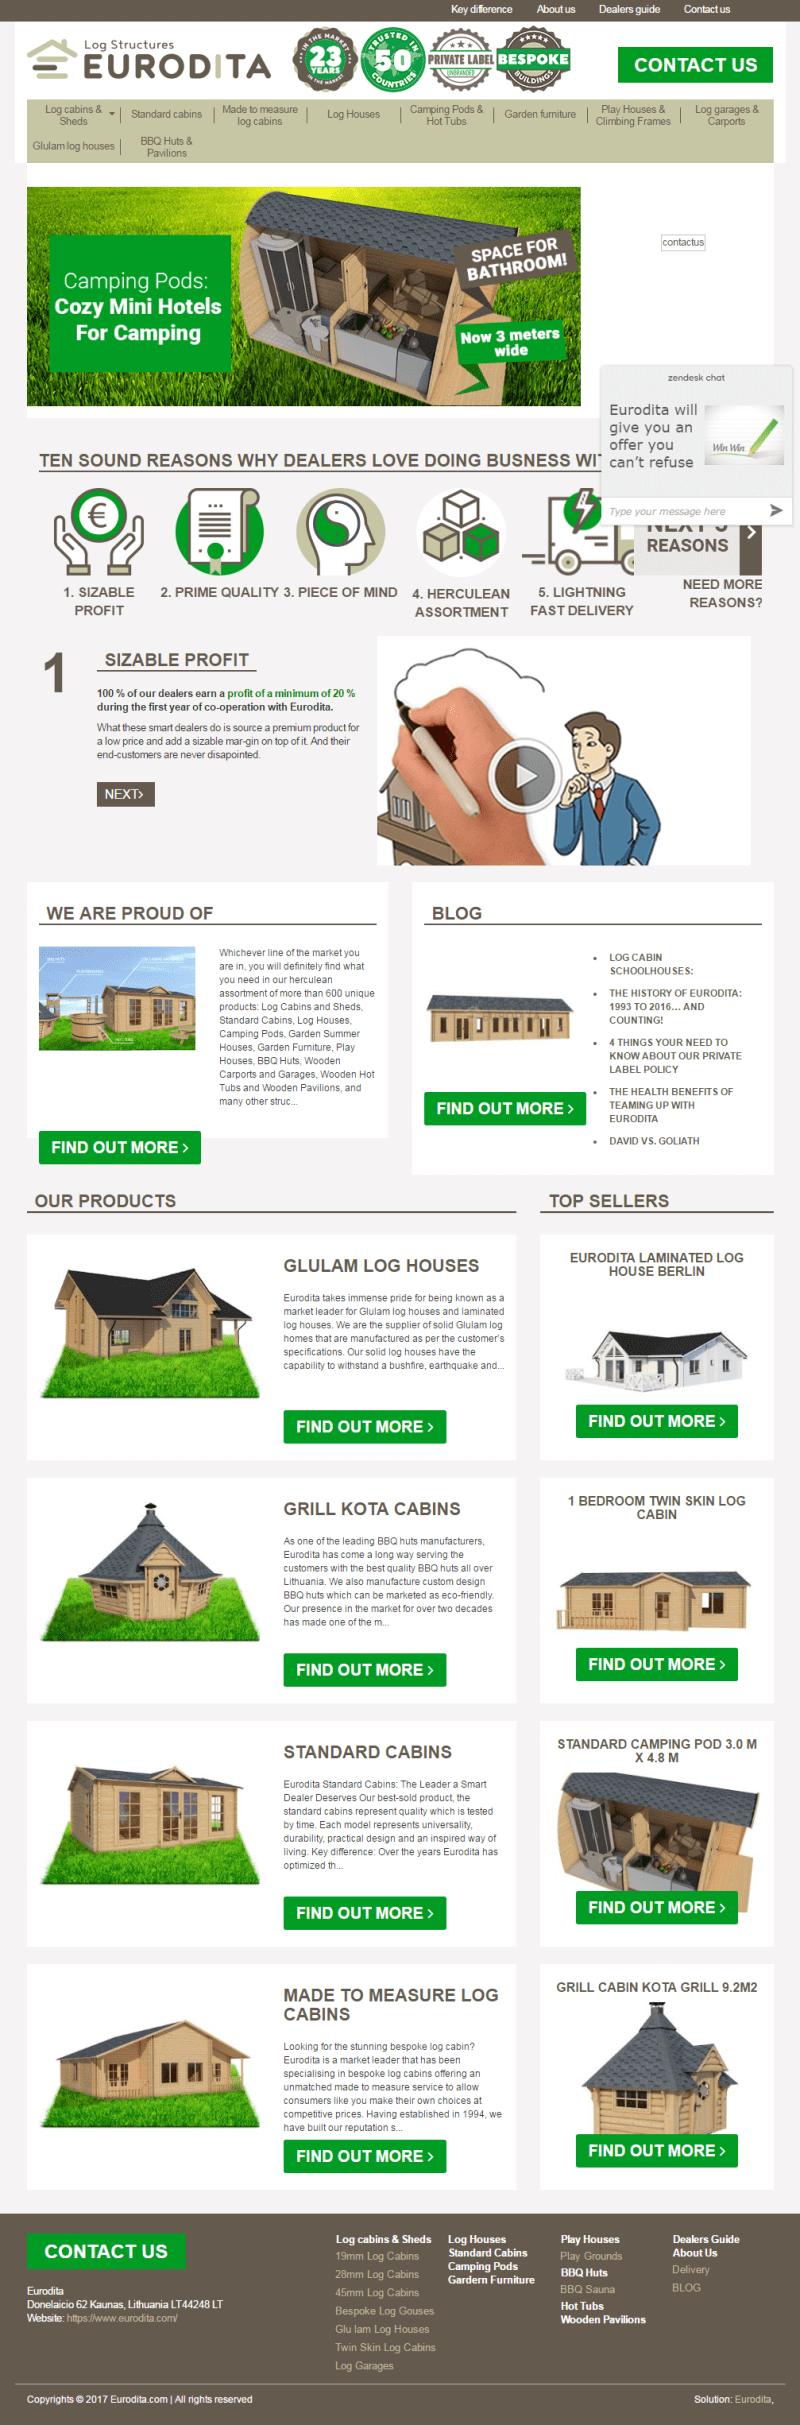 Log Homes Log Cabins Manufacturers Garden Buildings UK-min (1)